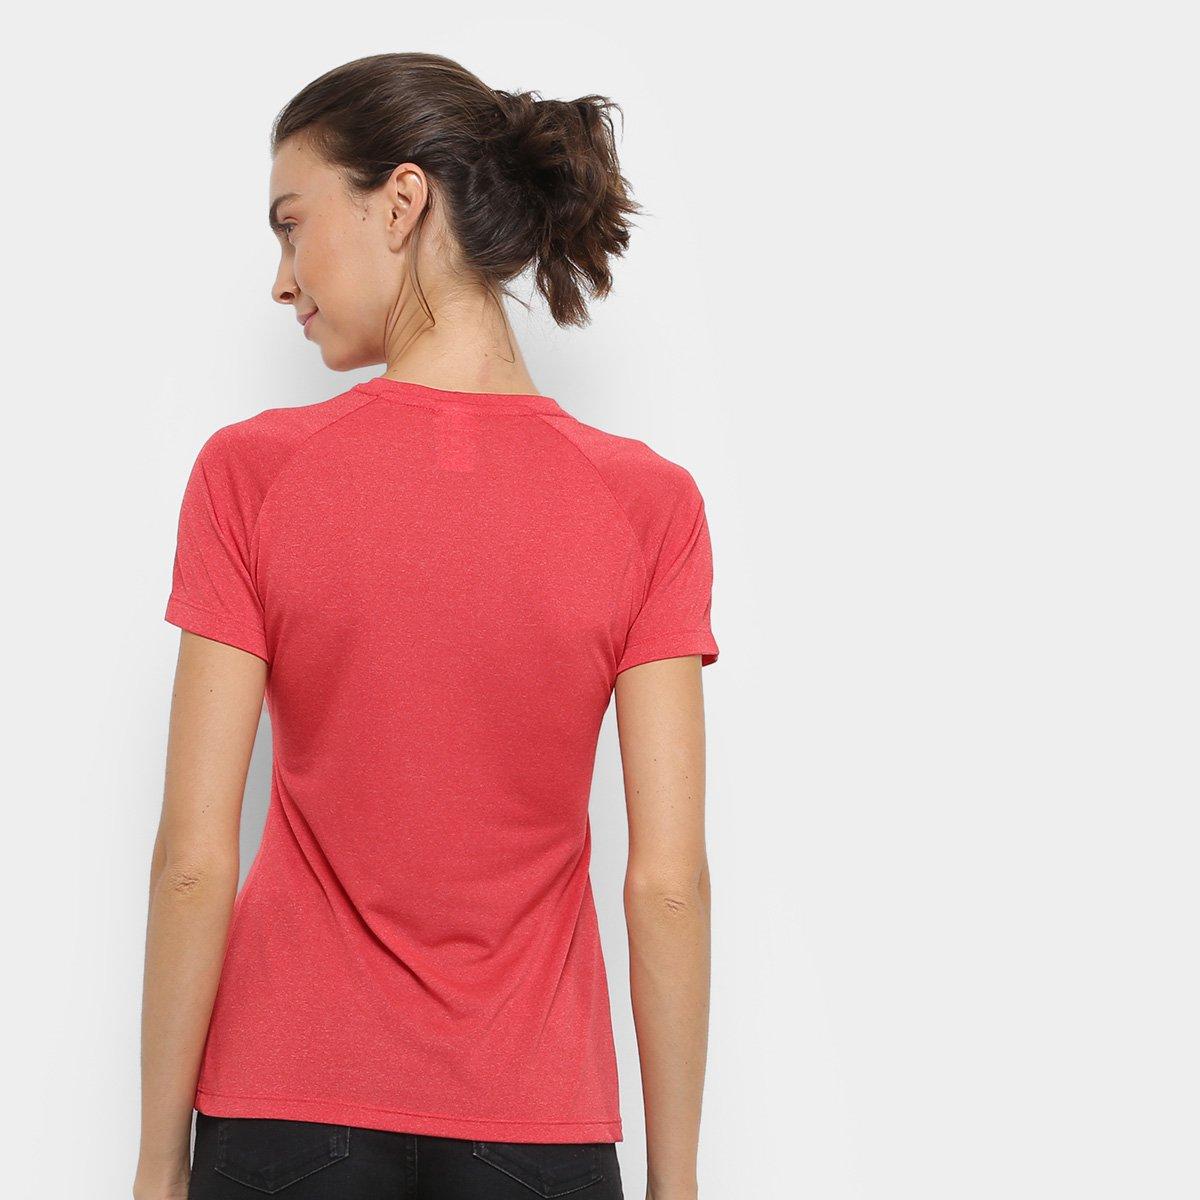 Camiseta Flamengo ADT Feminina  Camiseta Flamengo ADT Feminina ... 8f69e2320599c